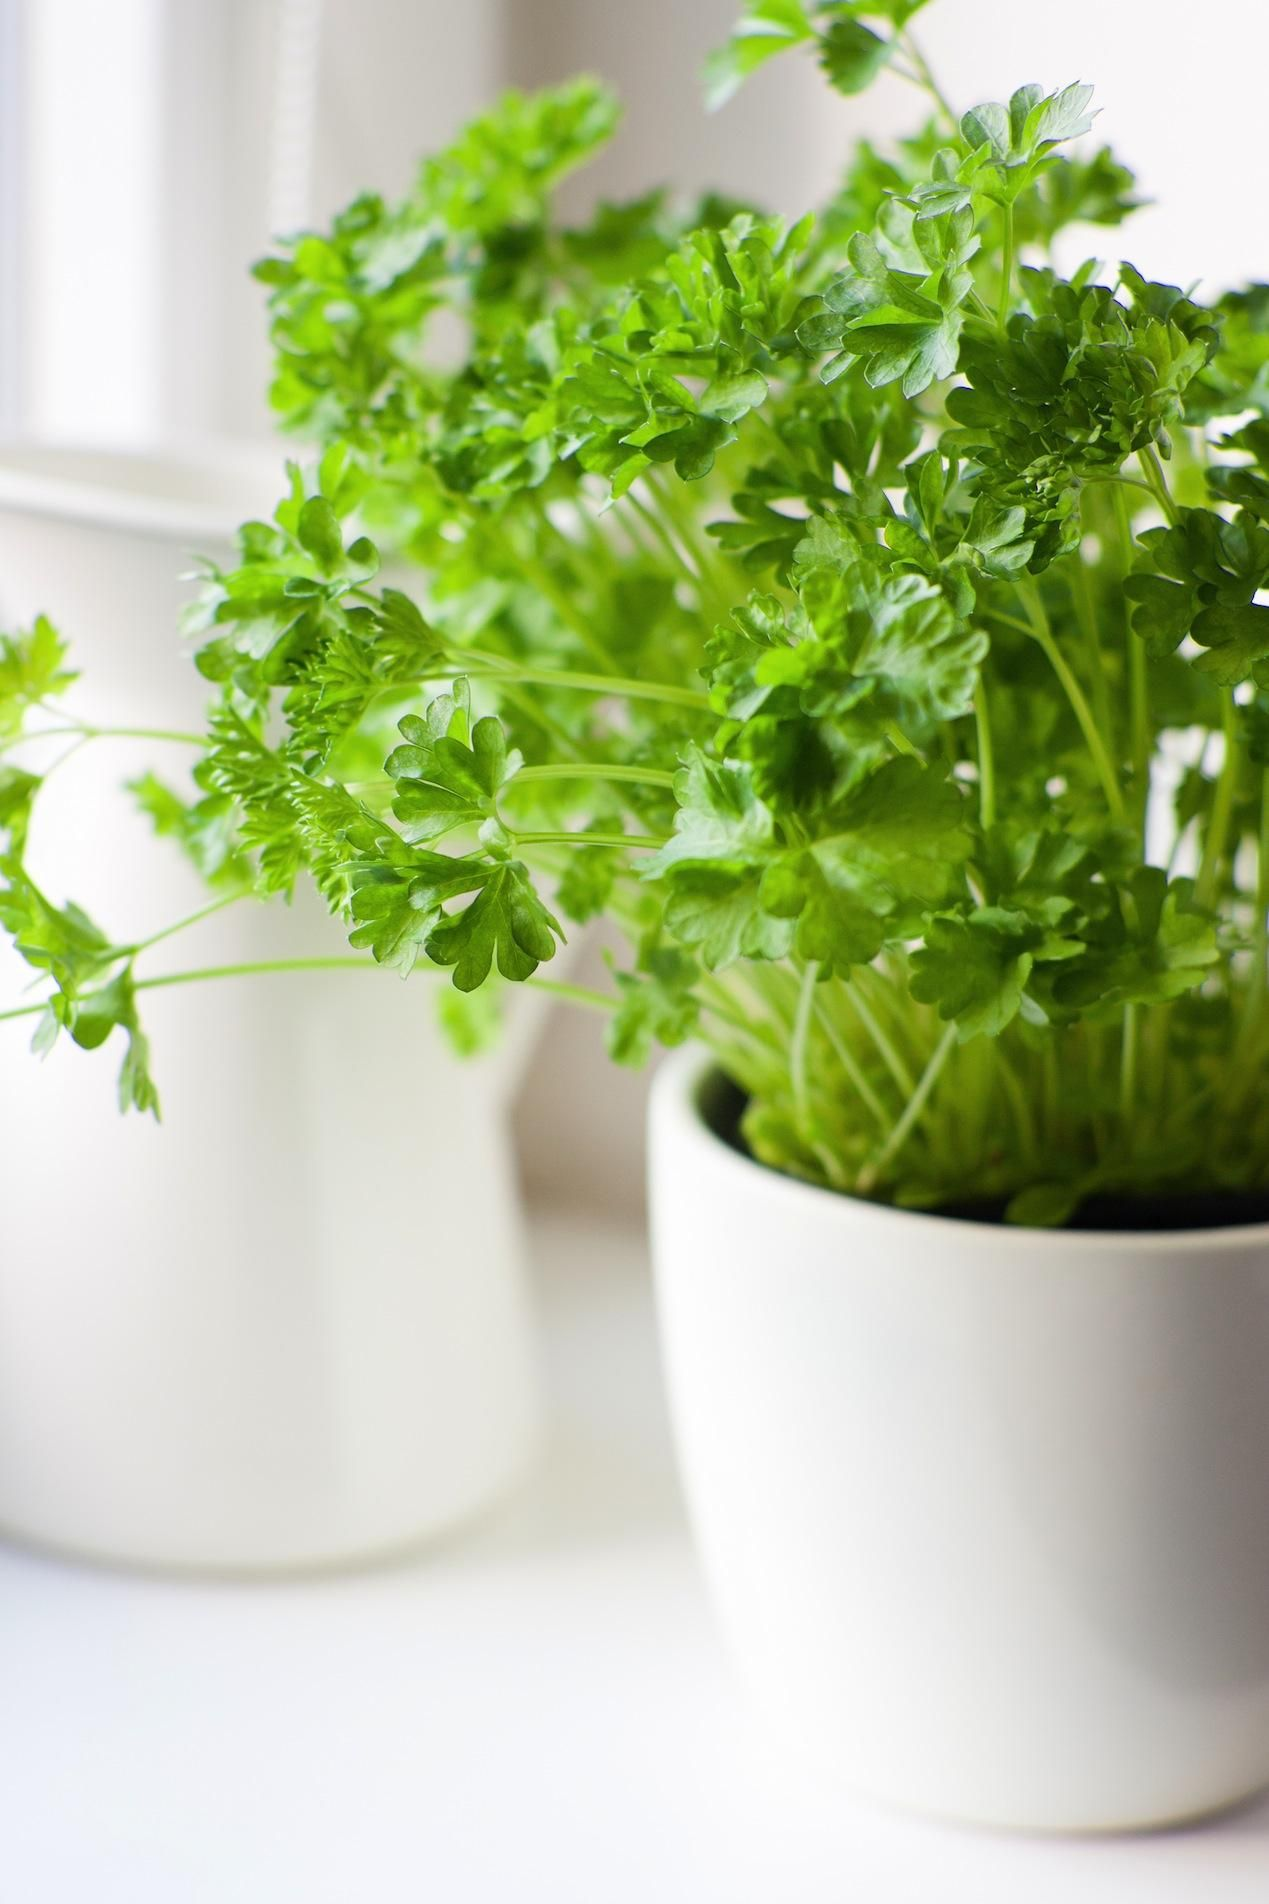 The 9 Easiest Herbs To Grow Indoors Growing Herbs 400 x 300